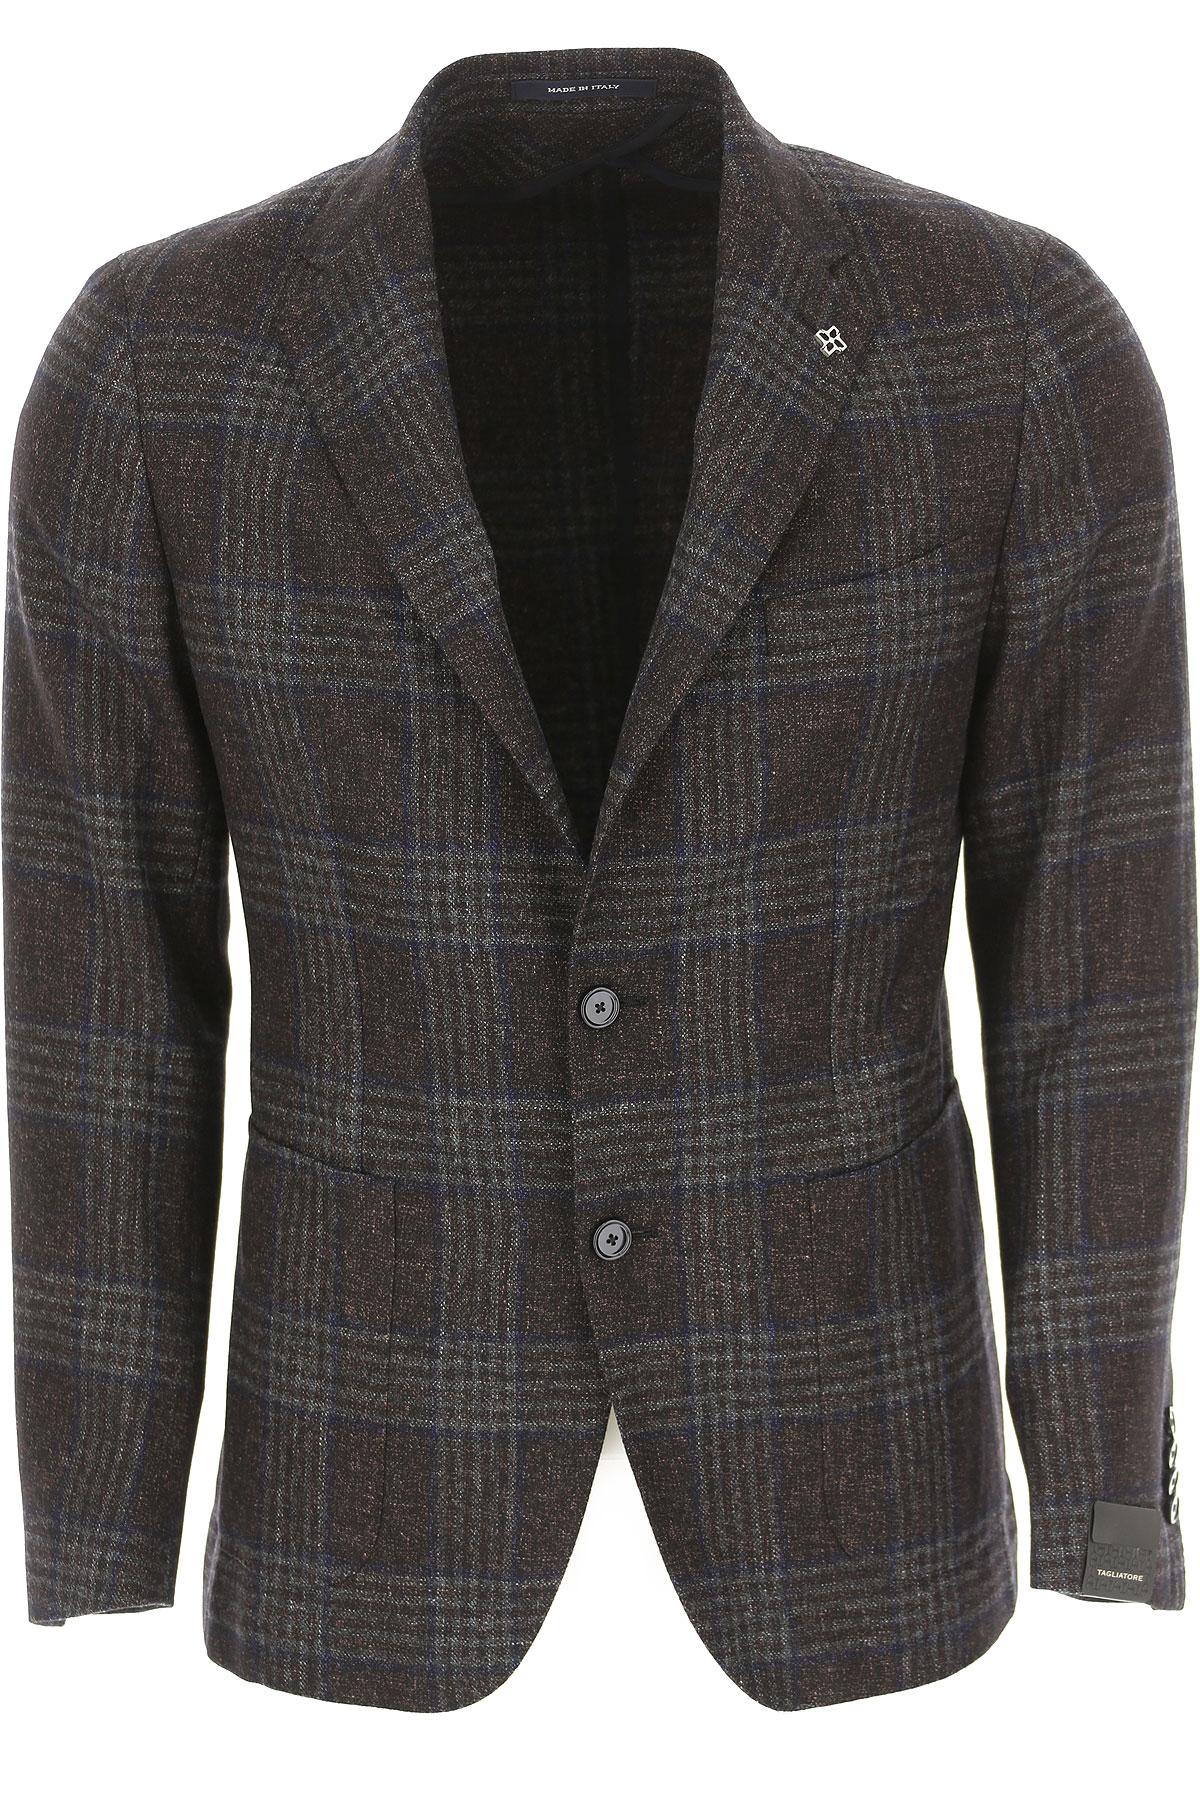 Image of Tagliatore Blazer for Men, Sport Coat, Brown, Virgin wool, 2017, L M S XL